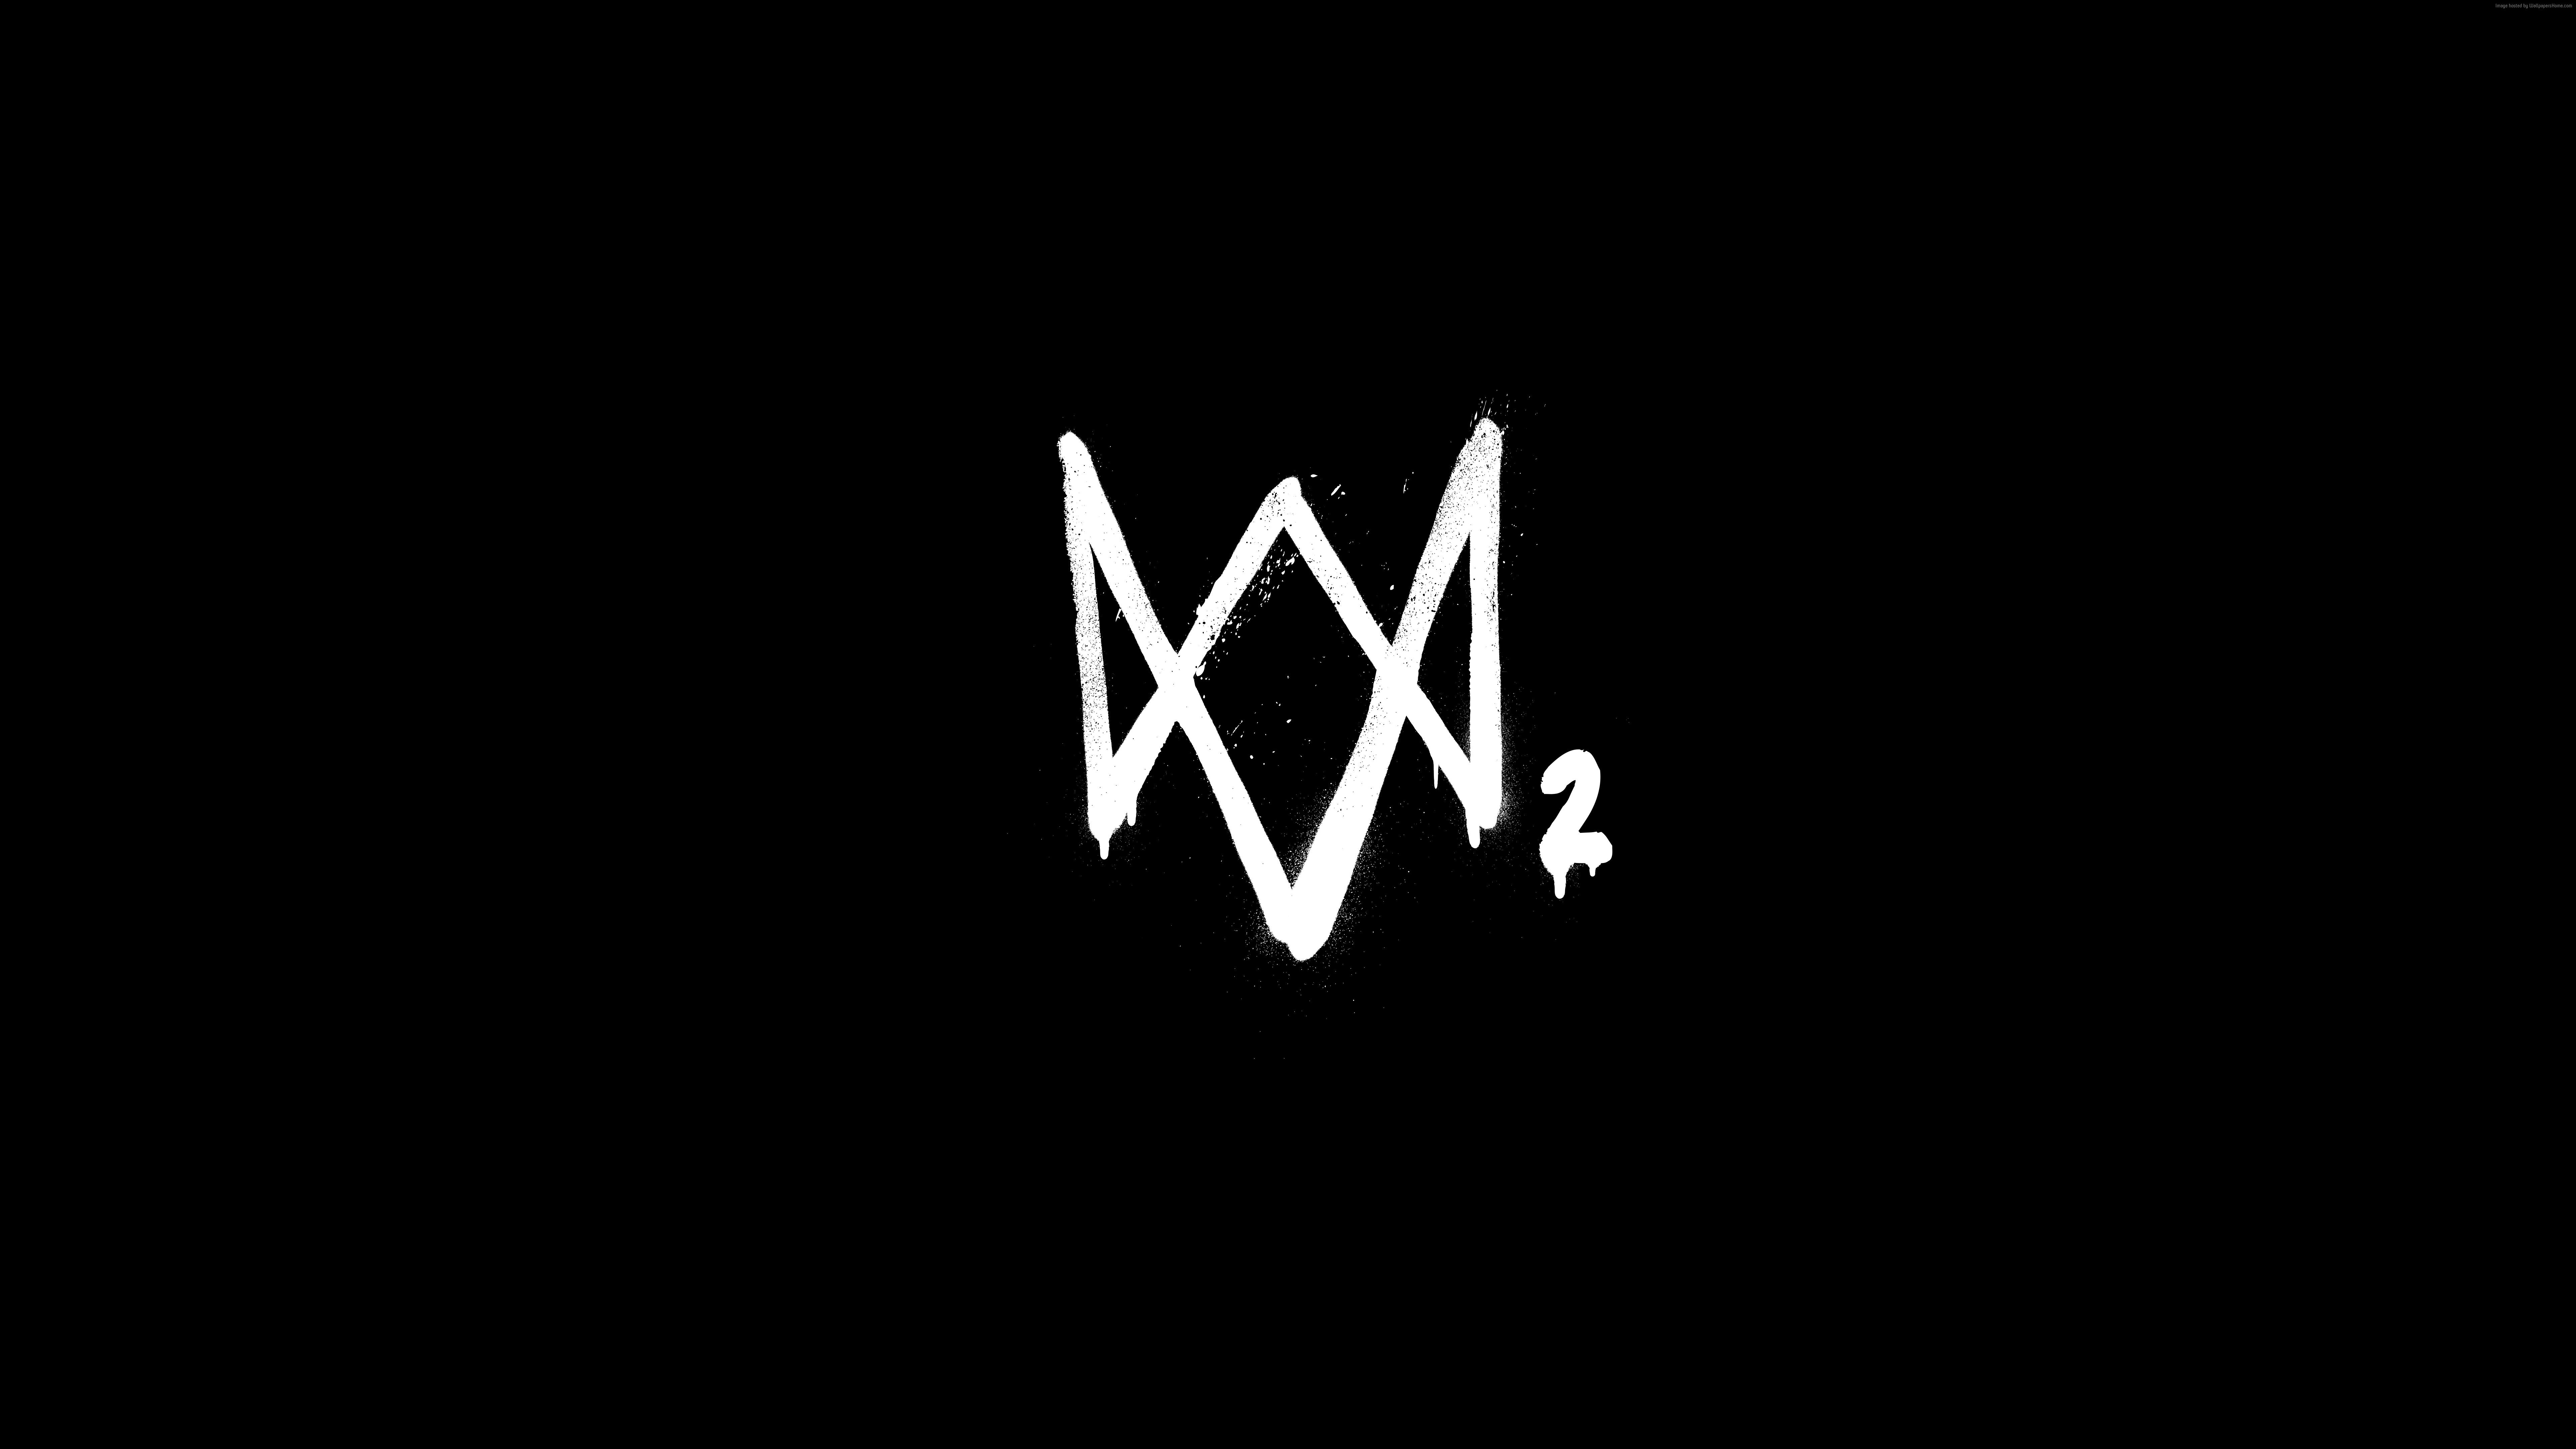 7680x4320 Watch Dogs 2 8k Logo 8k Hd 4k Wallpapers Images